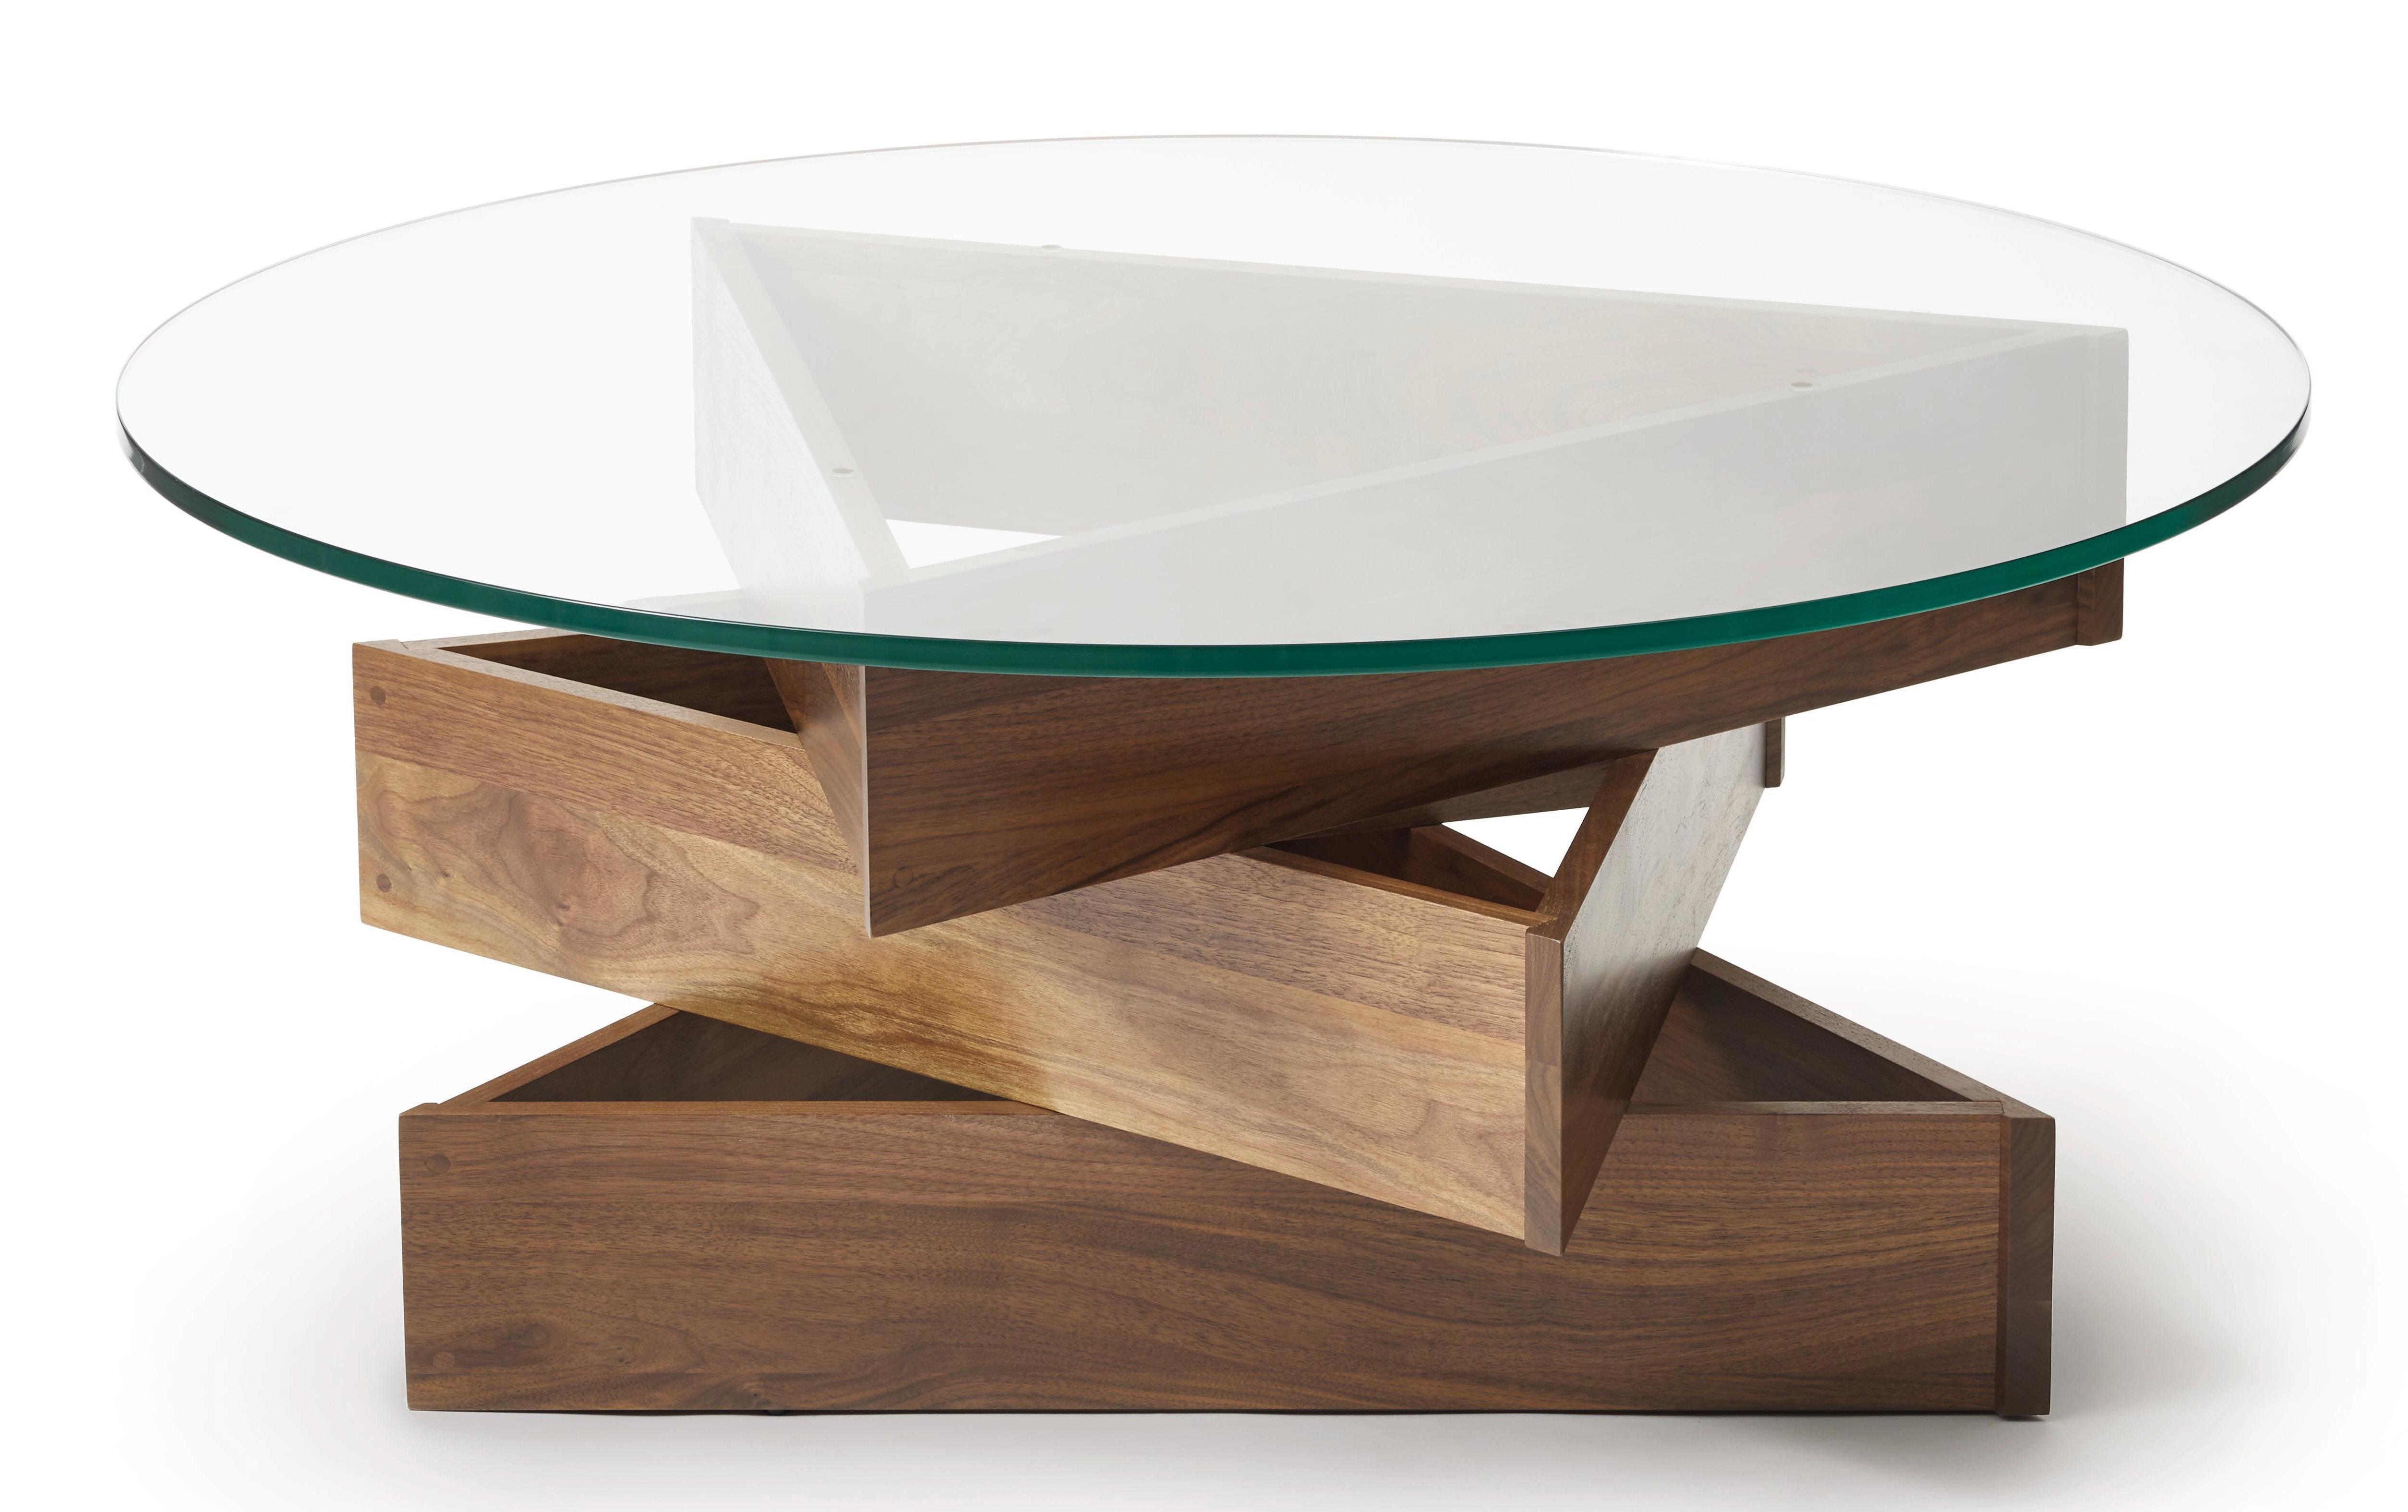 Barley Twist Coffee Tables Regarding Favorite Copeland Furniture Twist Coffee Table (View 19 of 20)